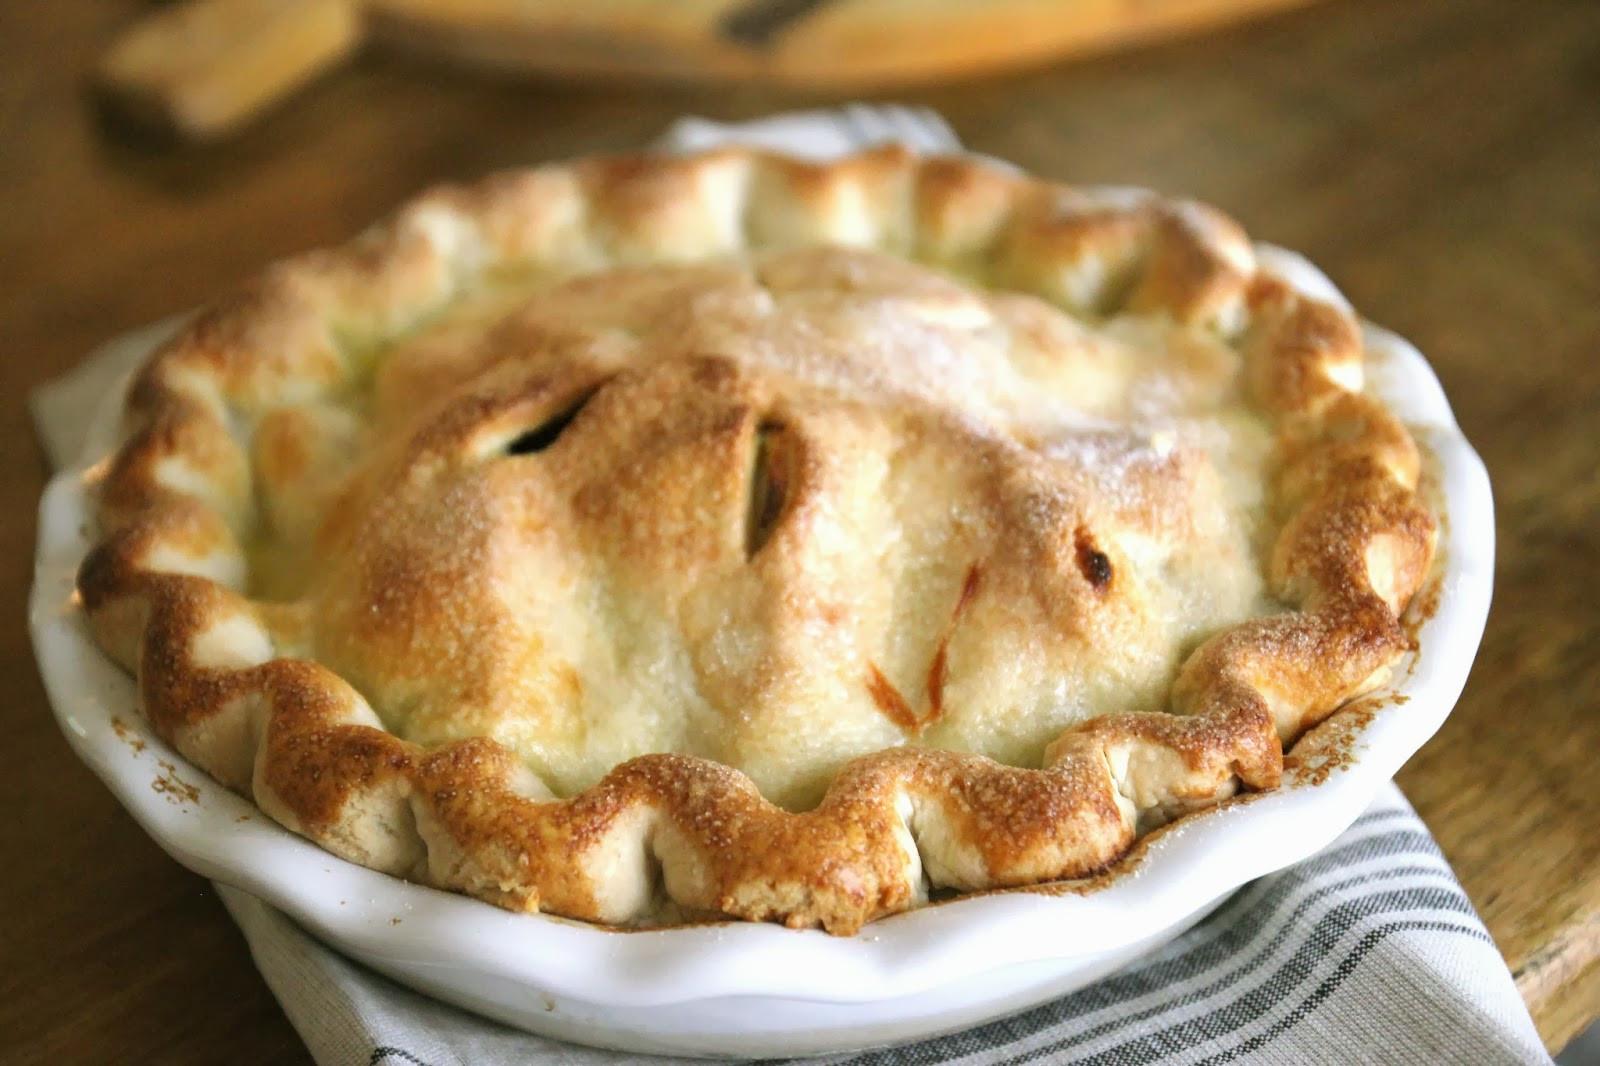 Apple Pie Dessert  Jenny Steffens Hobick Spiced Apple Pie